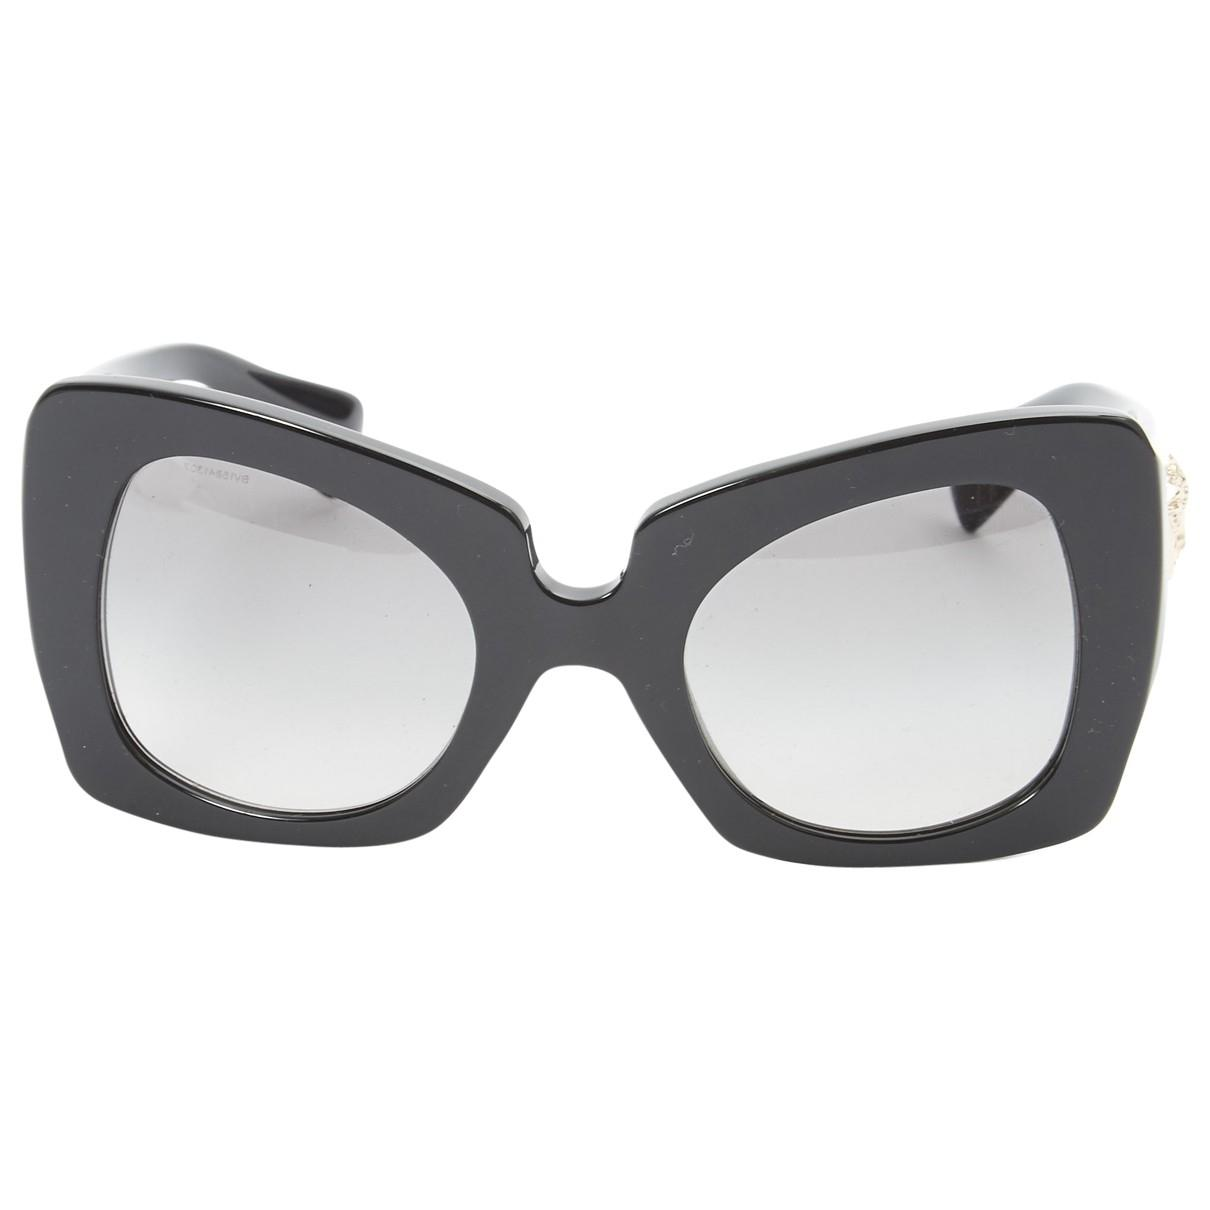 e69df029b2 Lyst - Versace Sunglasses in Black